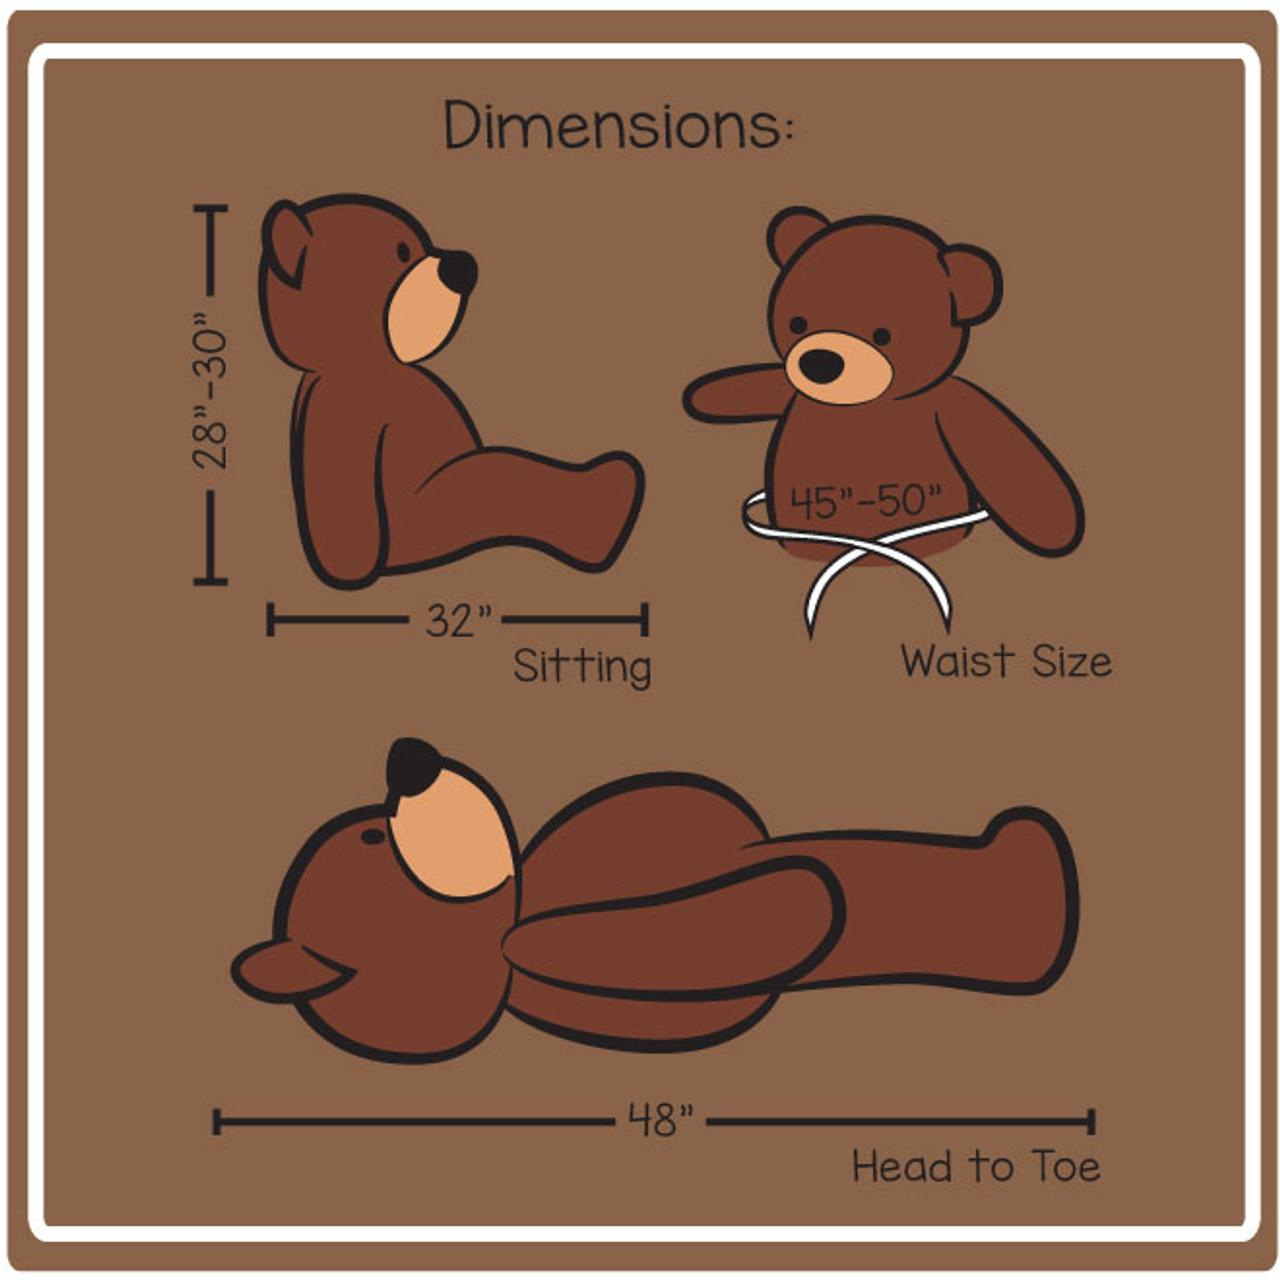 4ft Cuddles Dimension